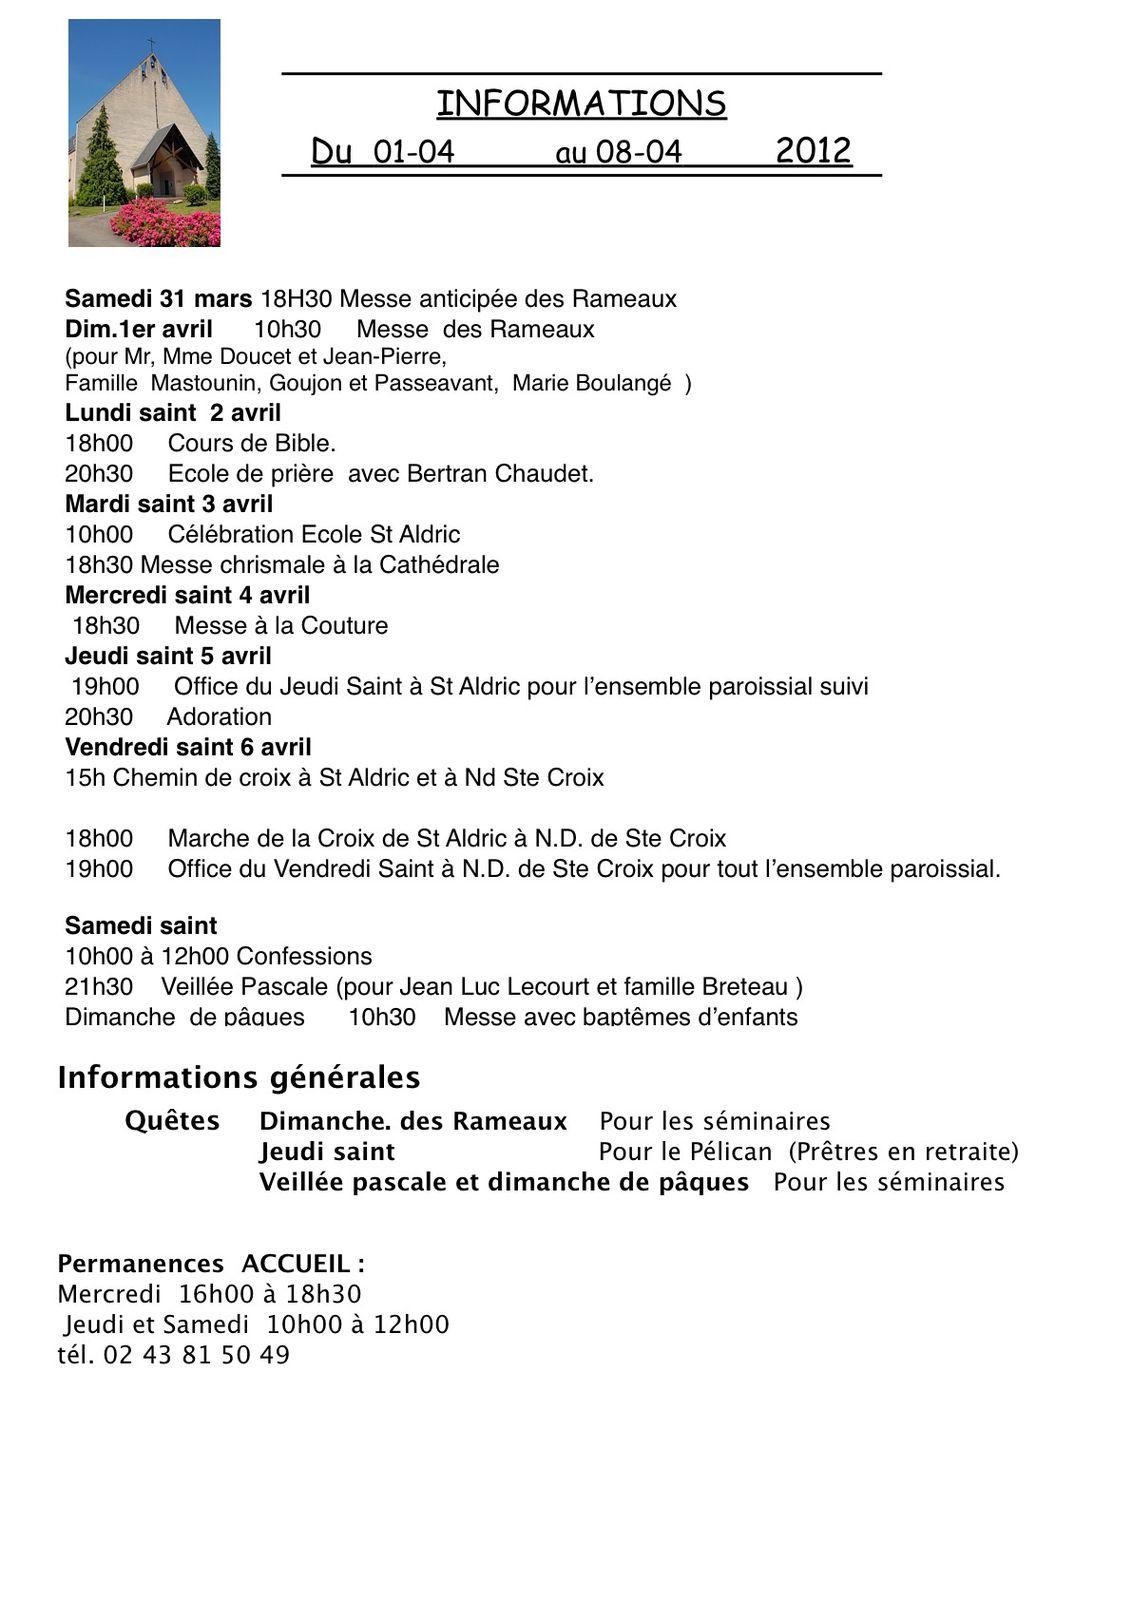 infopaques2012.jpg